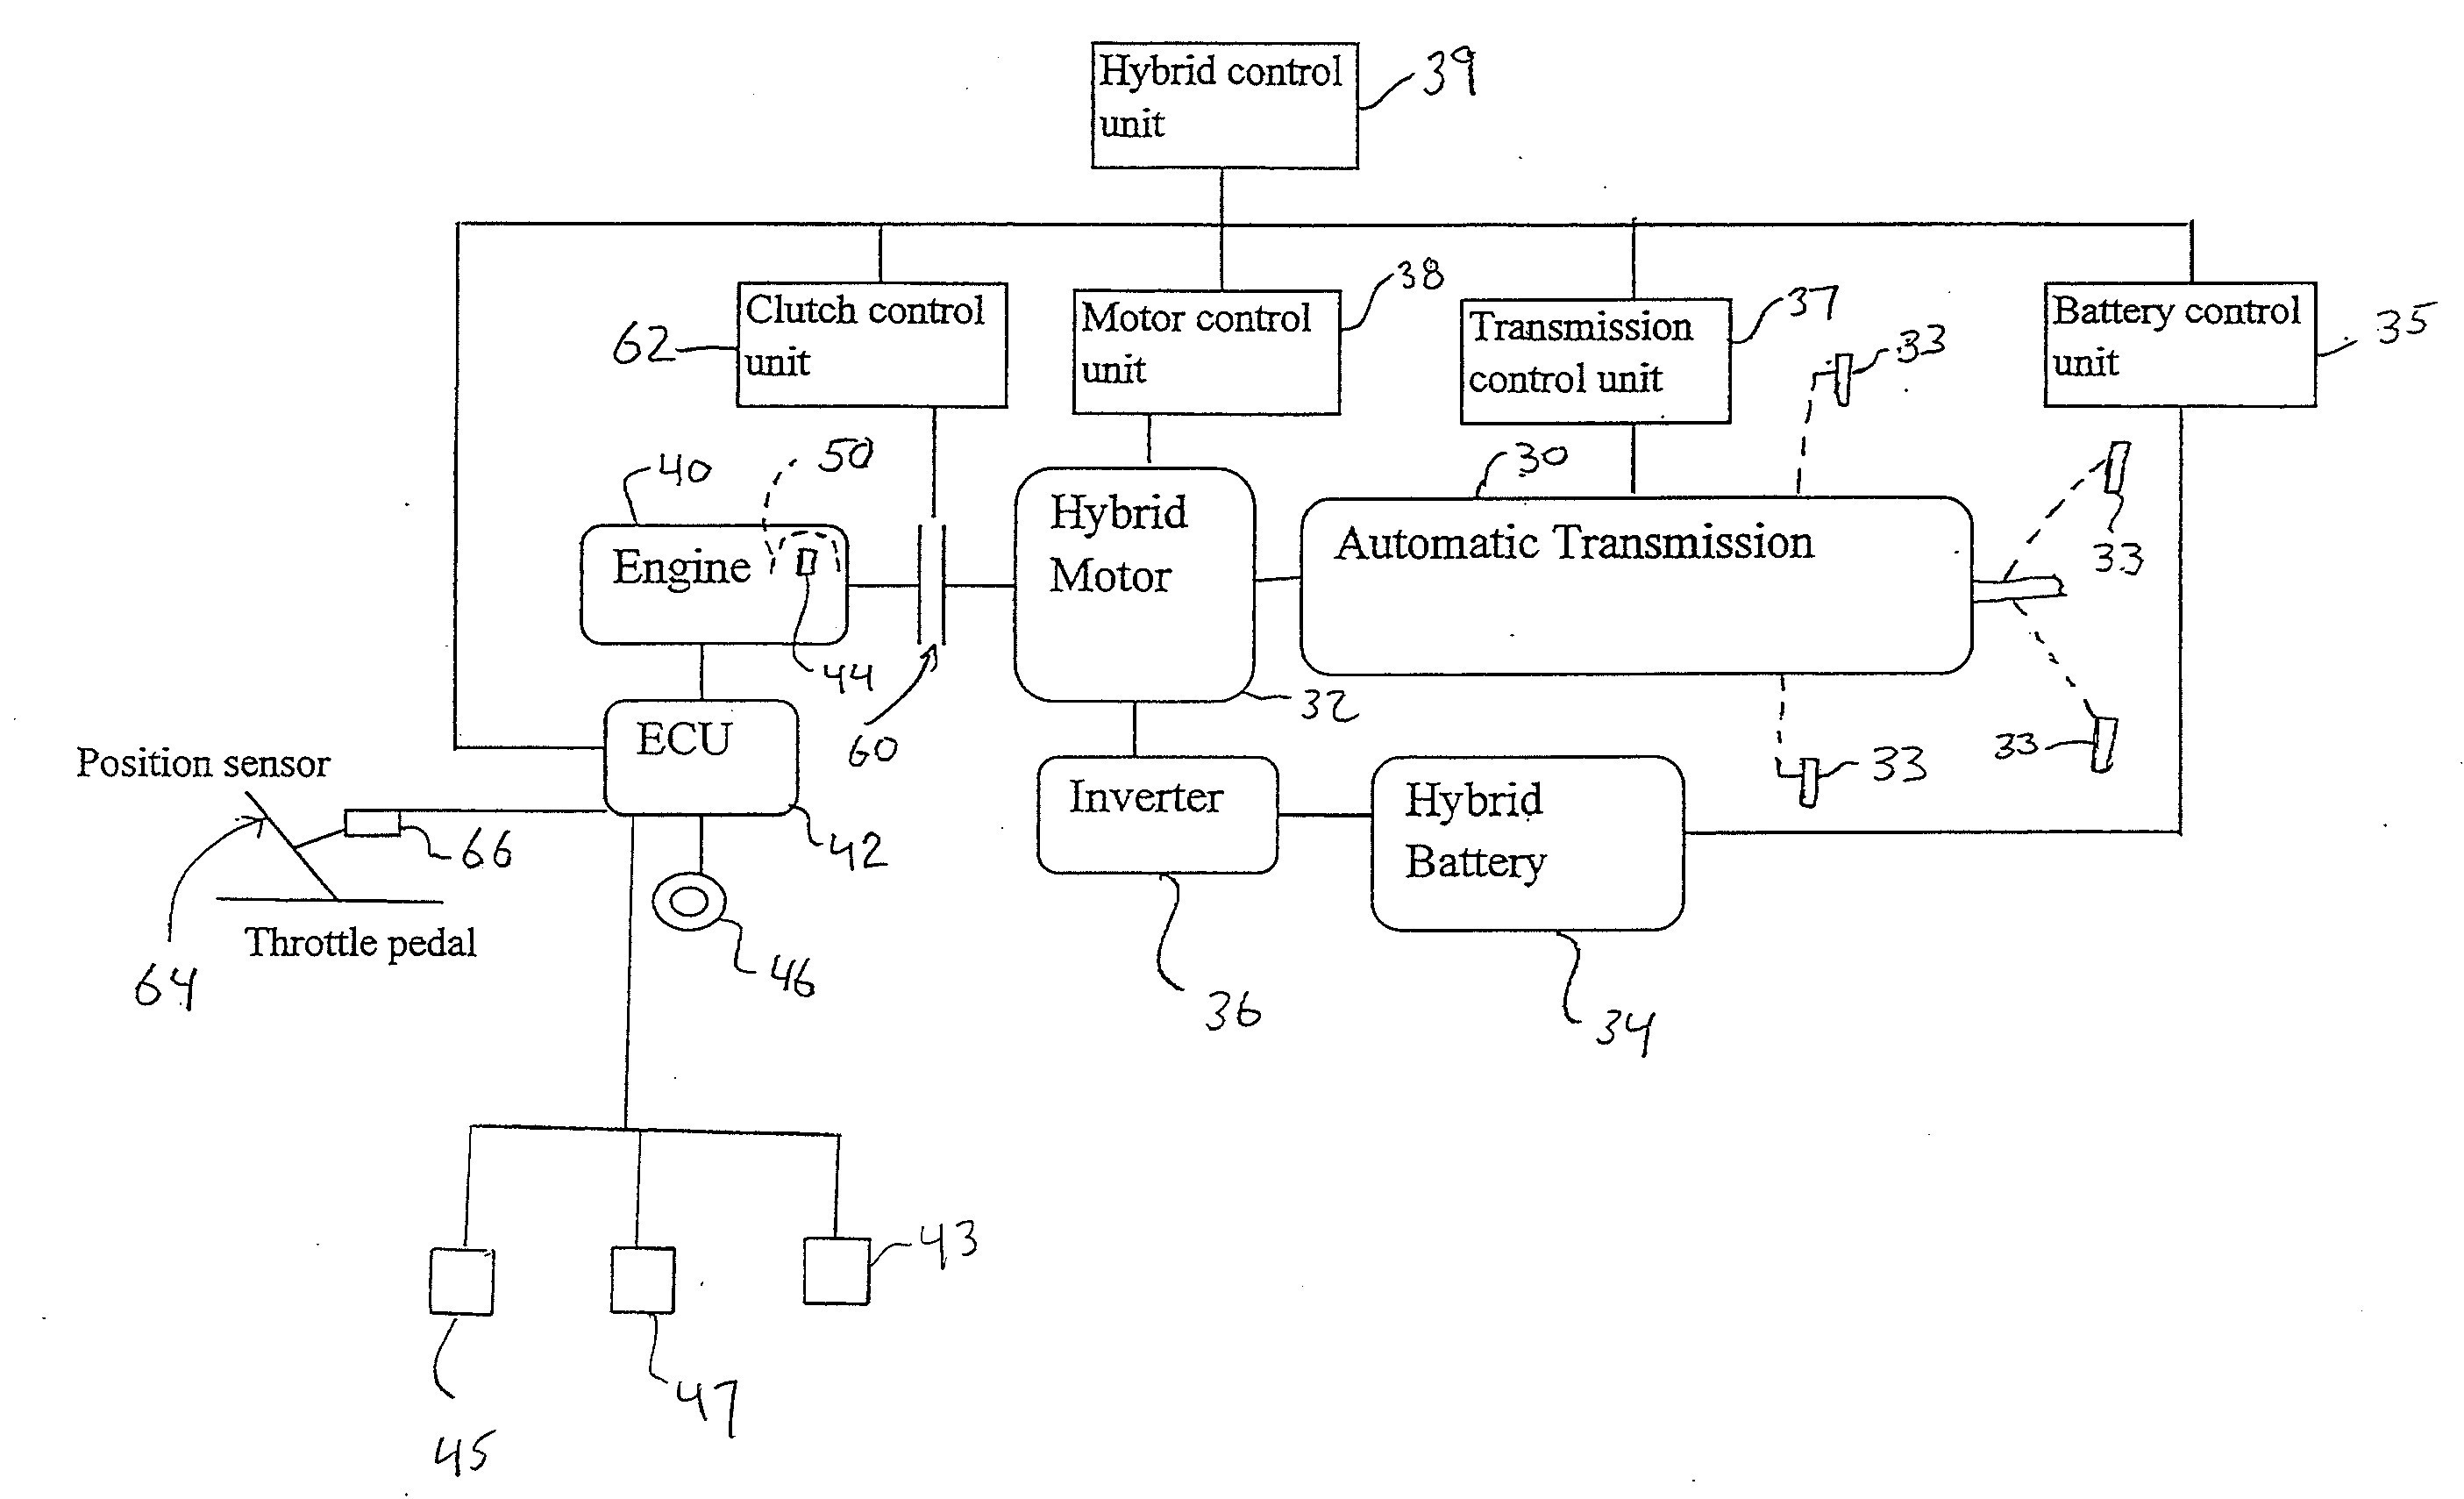 Freightliner Air System Diagram Freightliner Air Manifold System Diagram Trusted Wiring Diagram Of Freightliner Air System Diagram